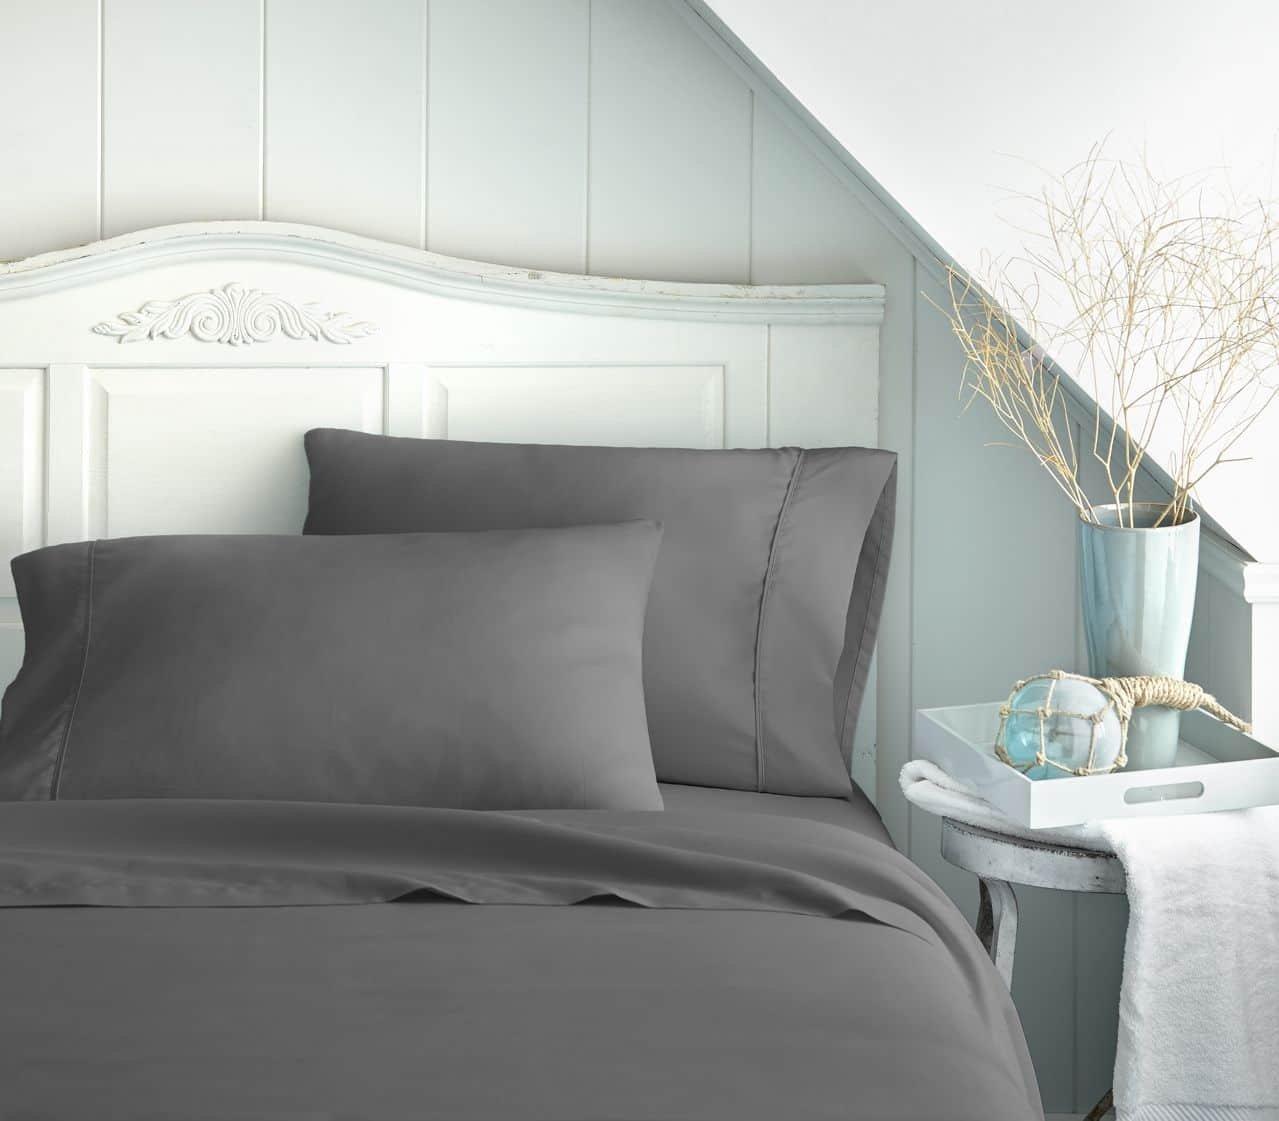 Amazon.com: Bed Sheet Set By Becky Cameron Bedding   Deep Pocket Sheets    1800 Series 4 Piece Set   Twin XL   Gray: Home U0026 Kitchen